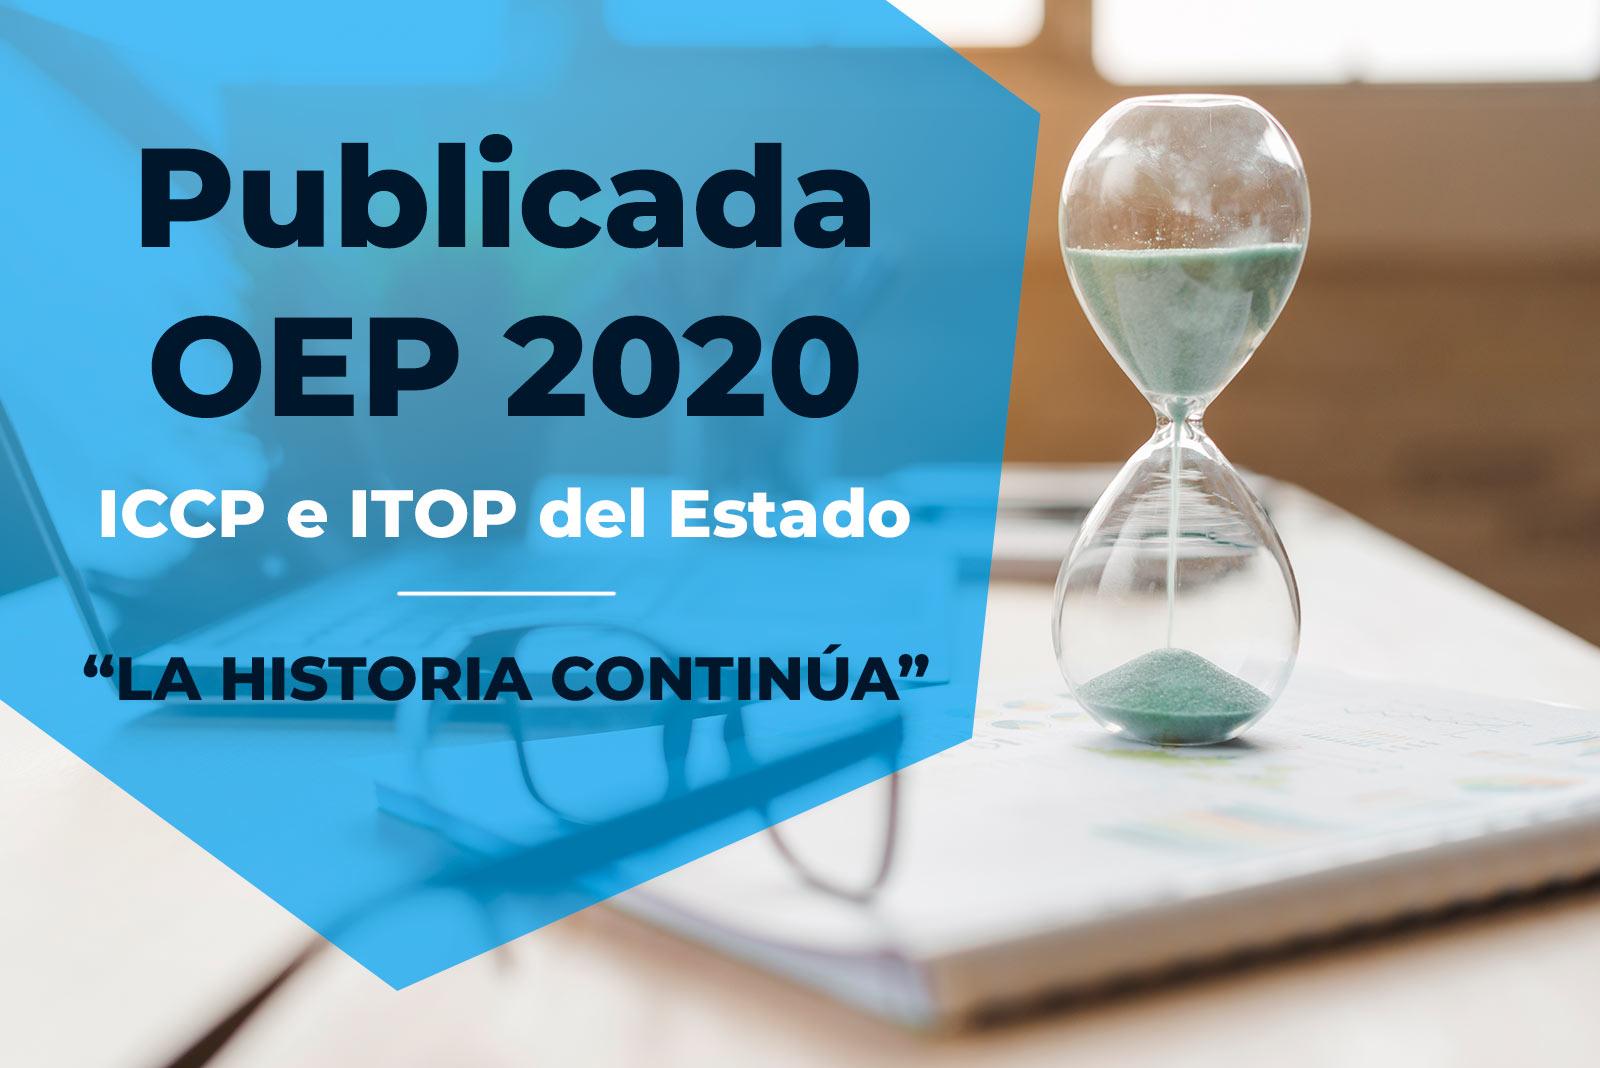 oep 2020 ICCP itop